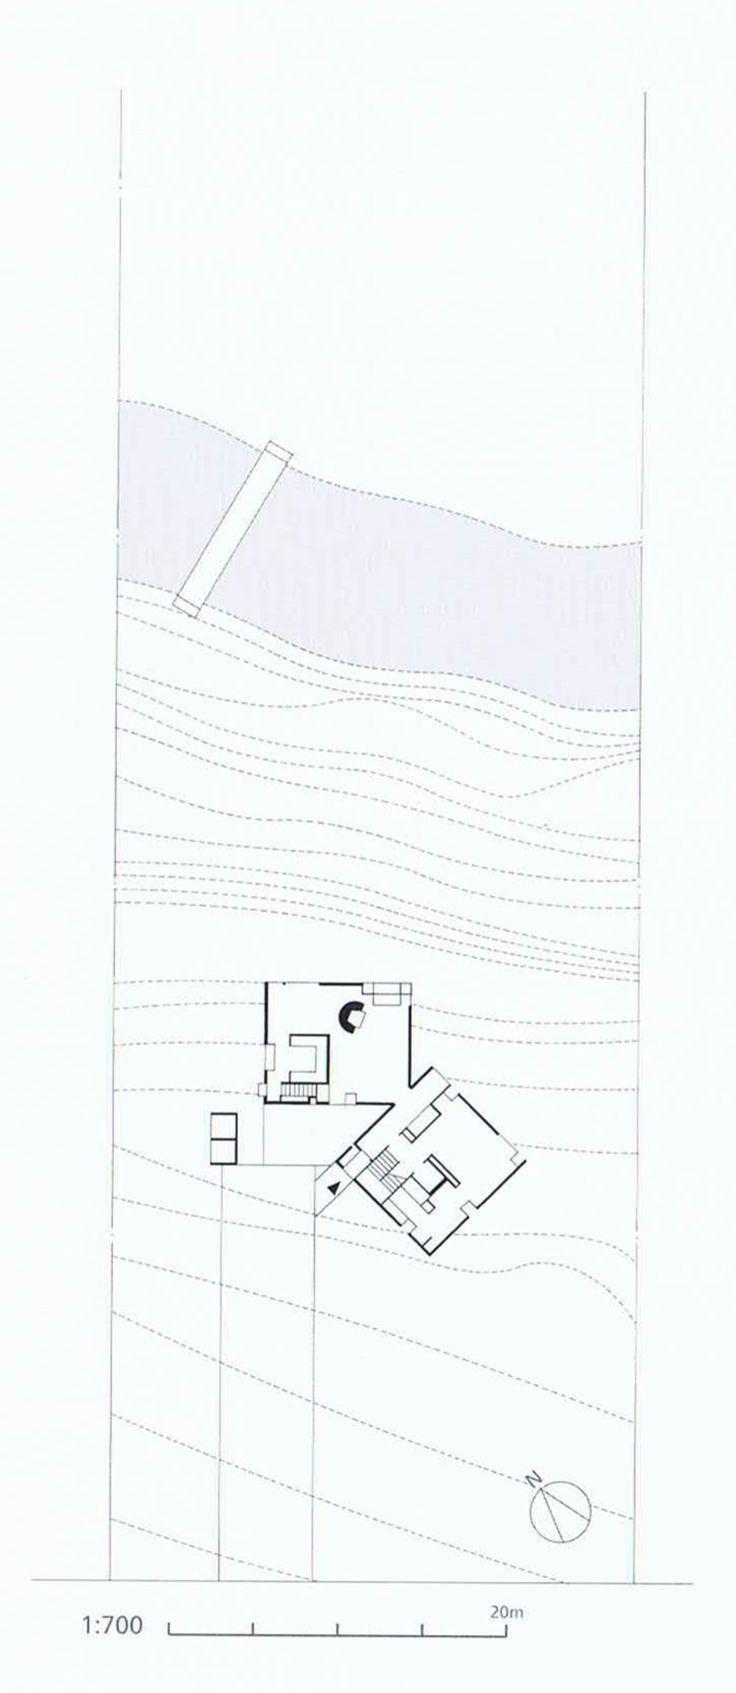 Louis Kahn Fisher house. Pensilvania, United States. 1960-1967